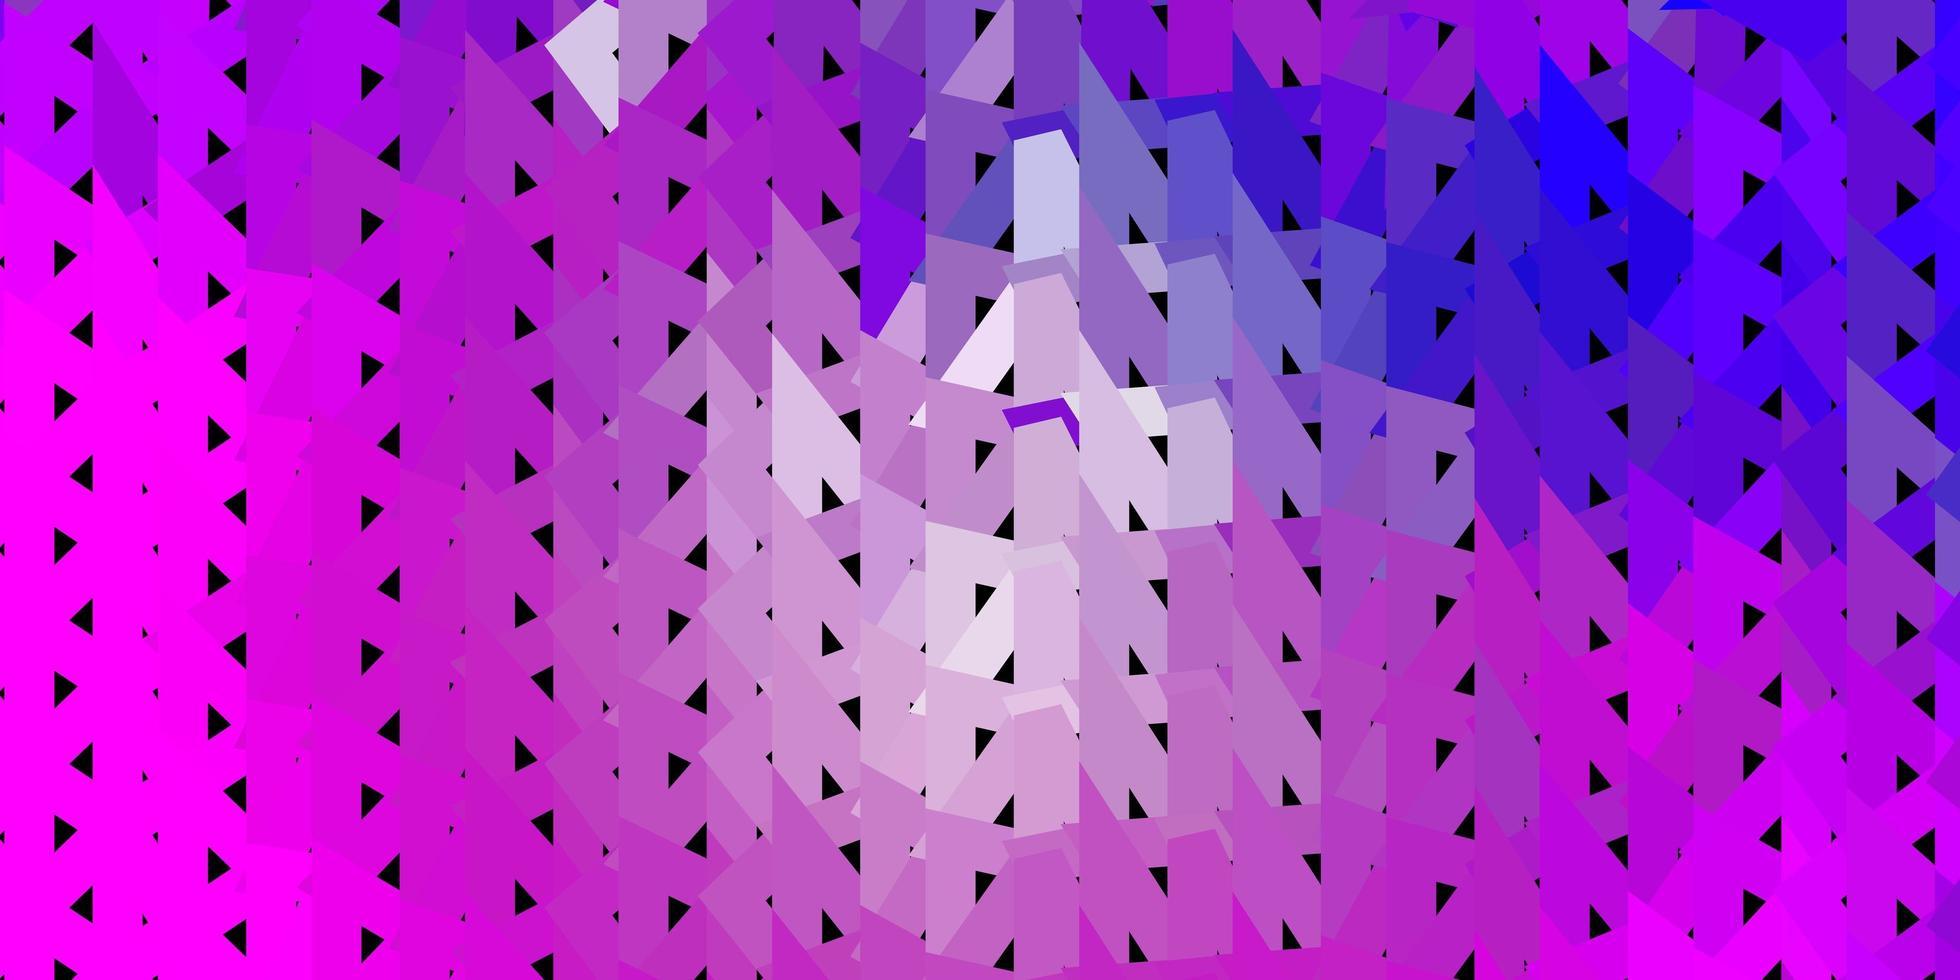 hellviolette, rosa Vektor abstrakte Dreiecksschablone.